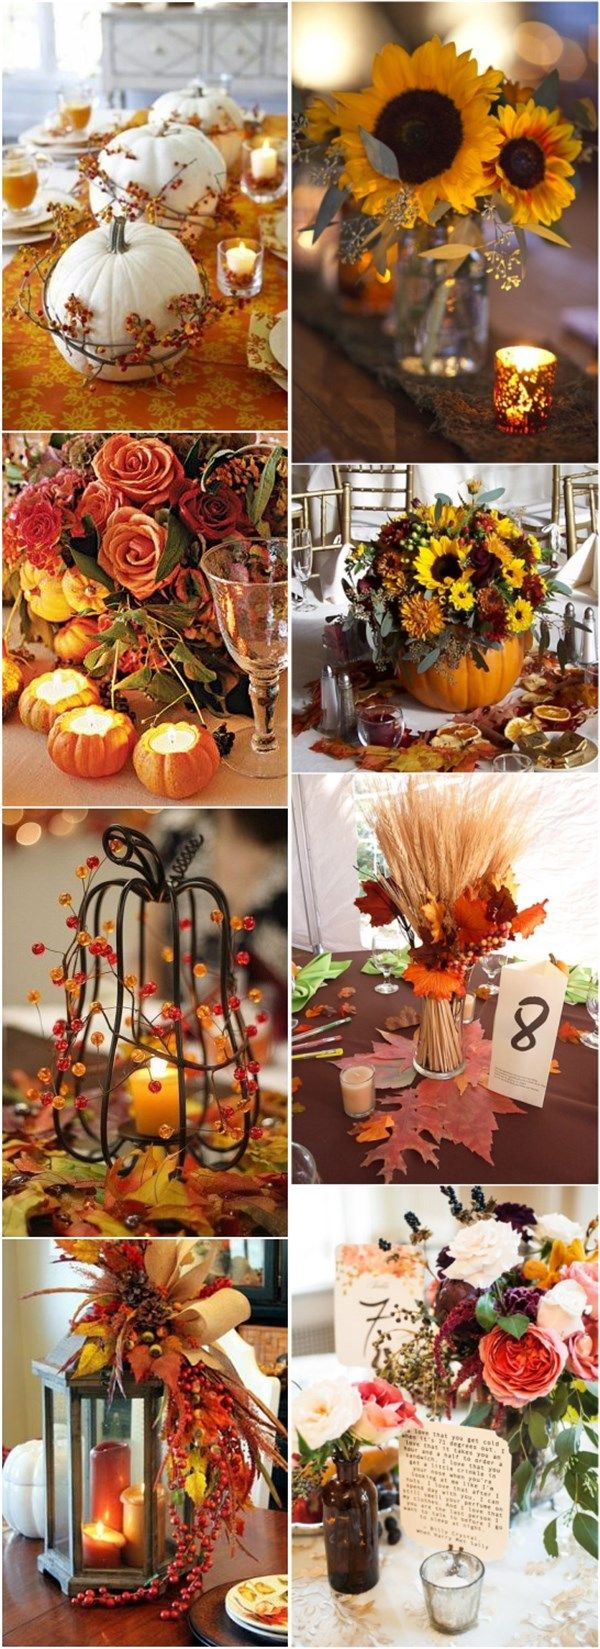 Fall wedding decoration ideas cheap   Vibrant and Fun Fall Wedding Centerpieces  Wedding centerpieces